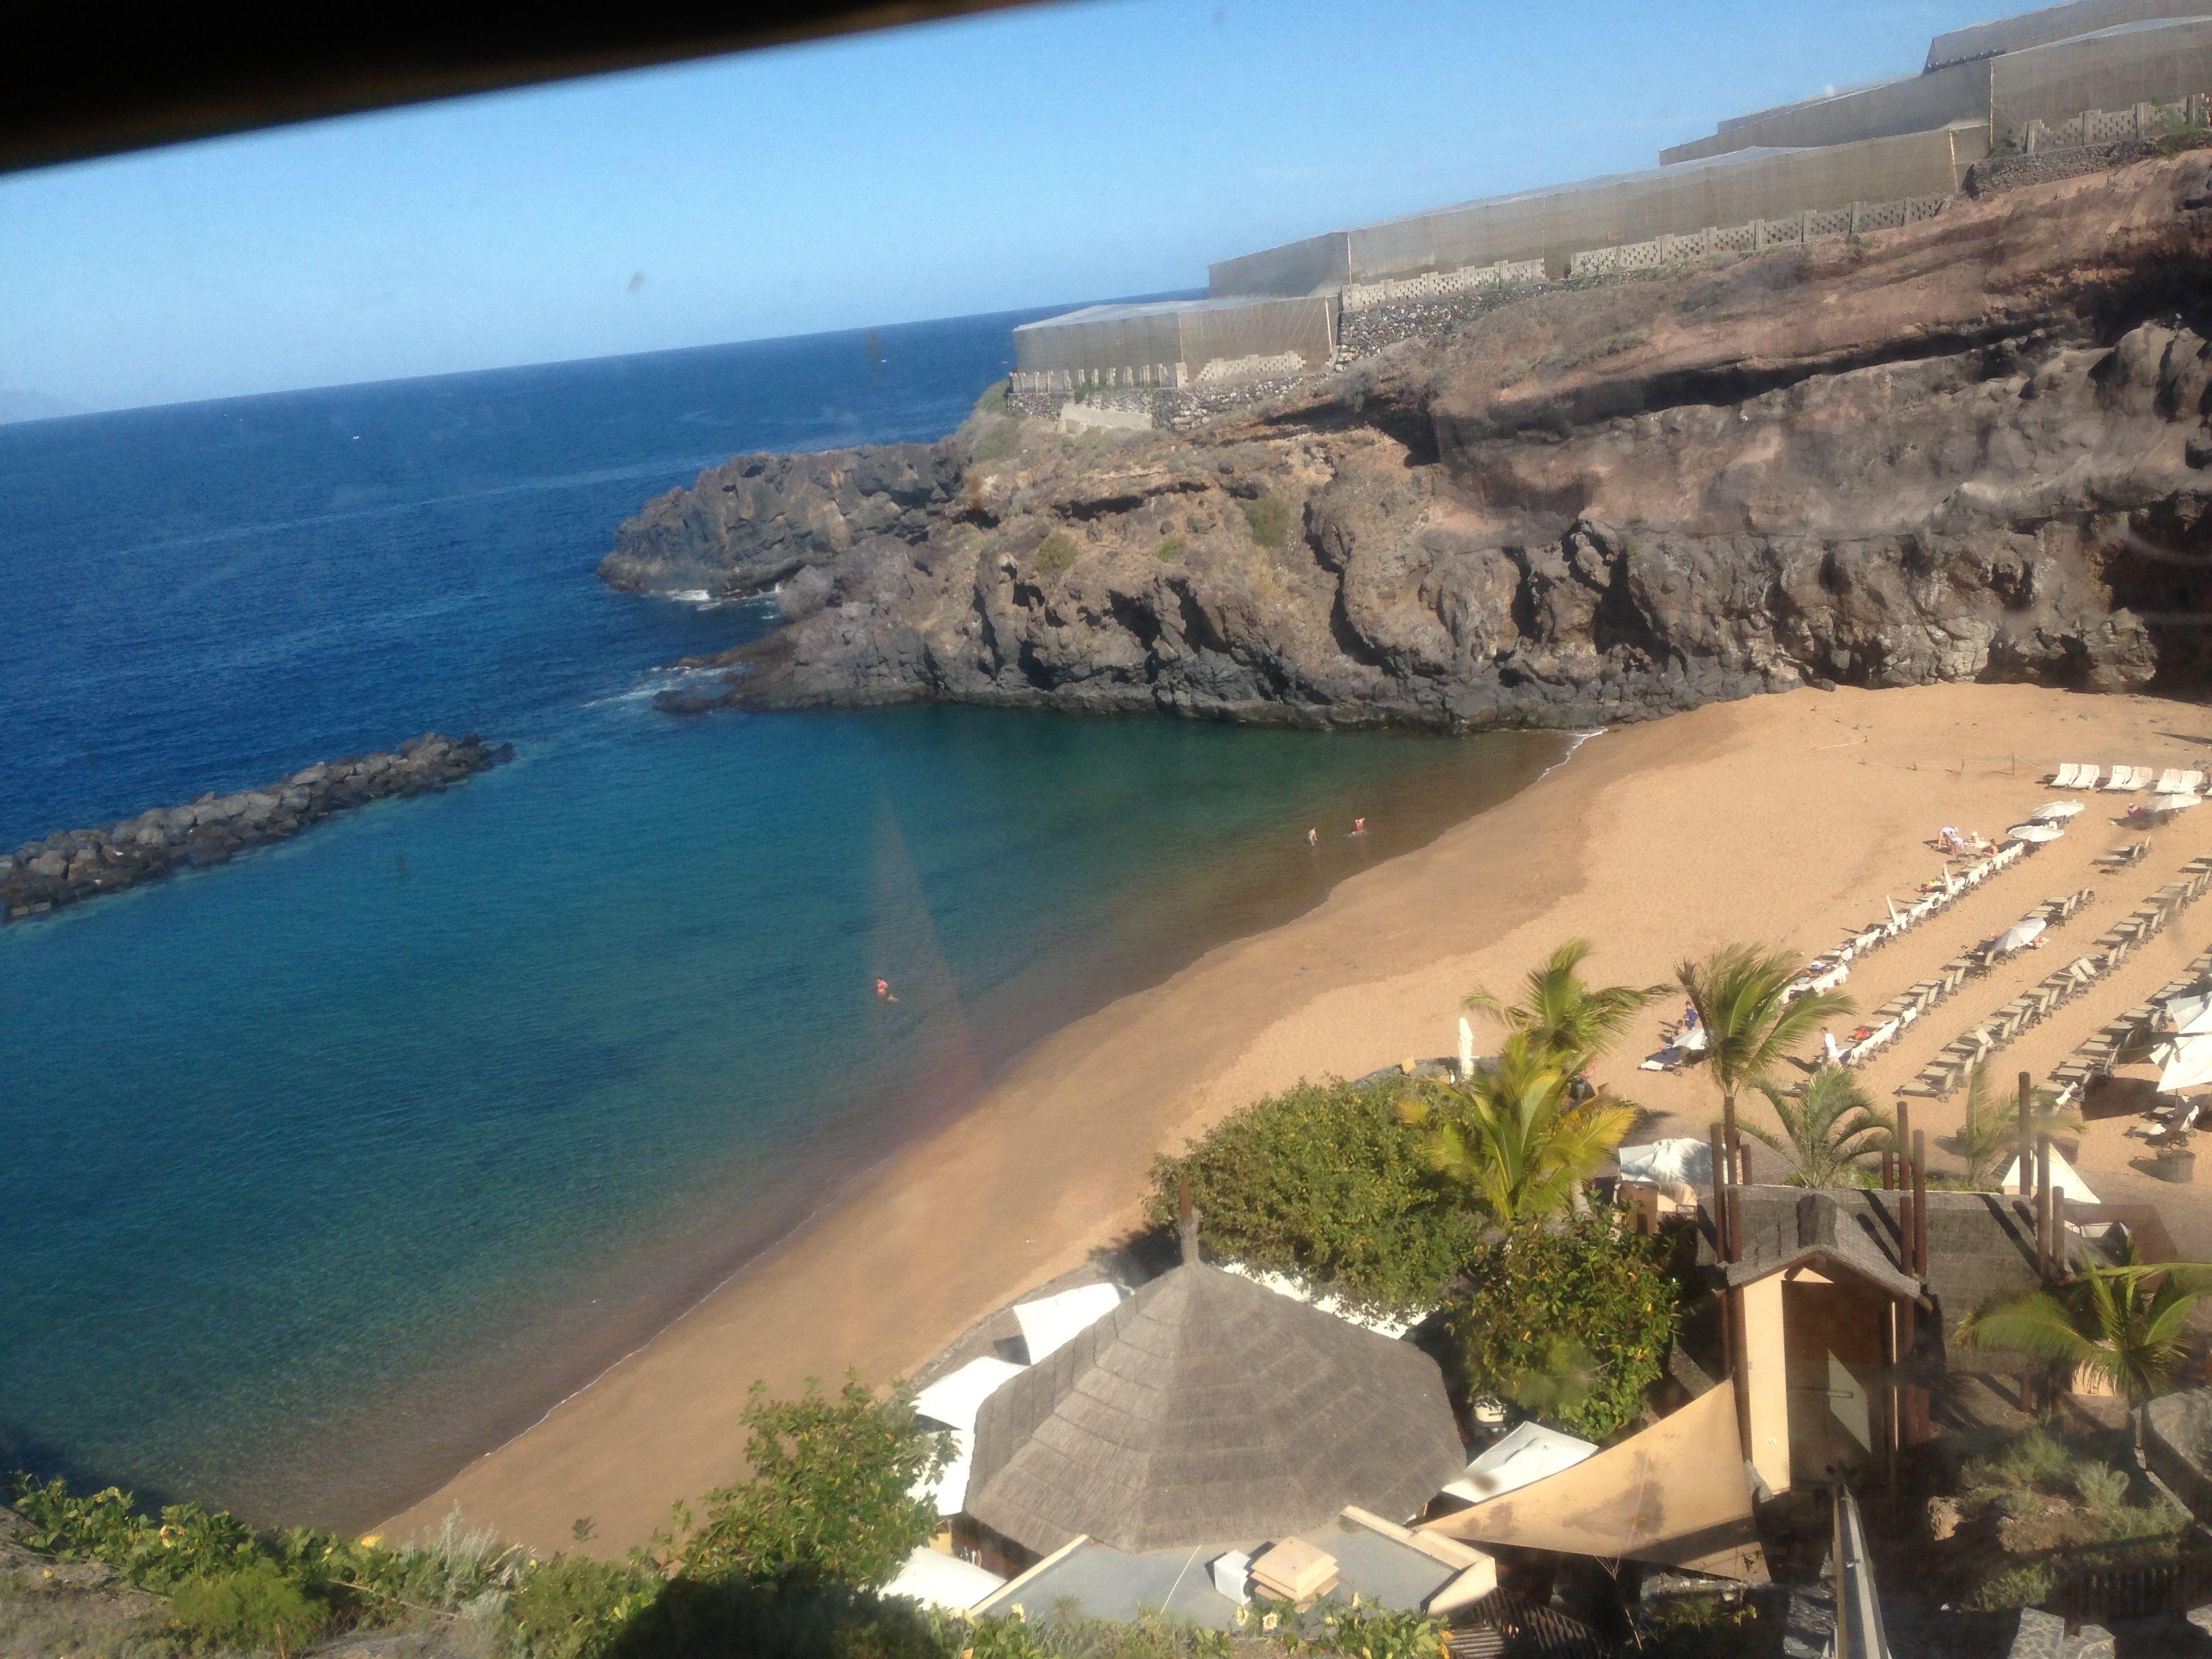 Tenerife hotel abama and beach a secluded and beautiful - Hotel abama tenerife ...